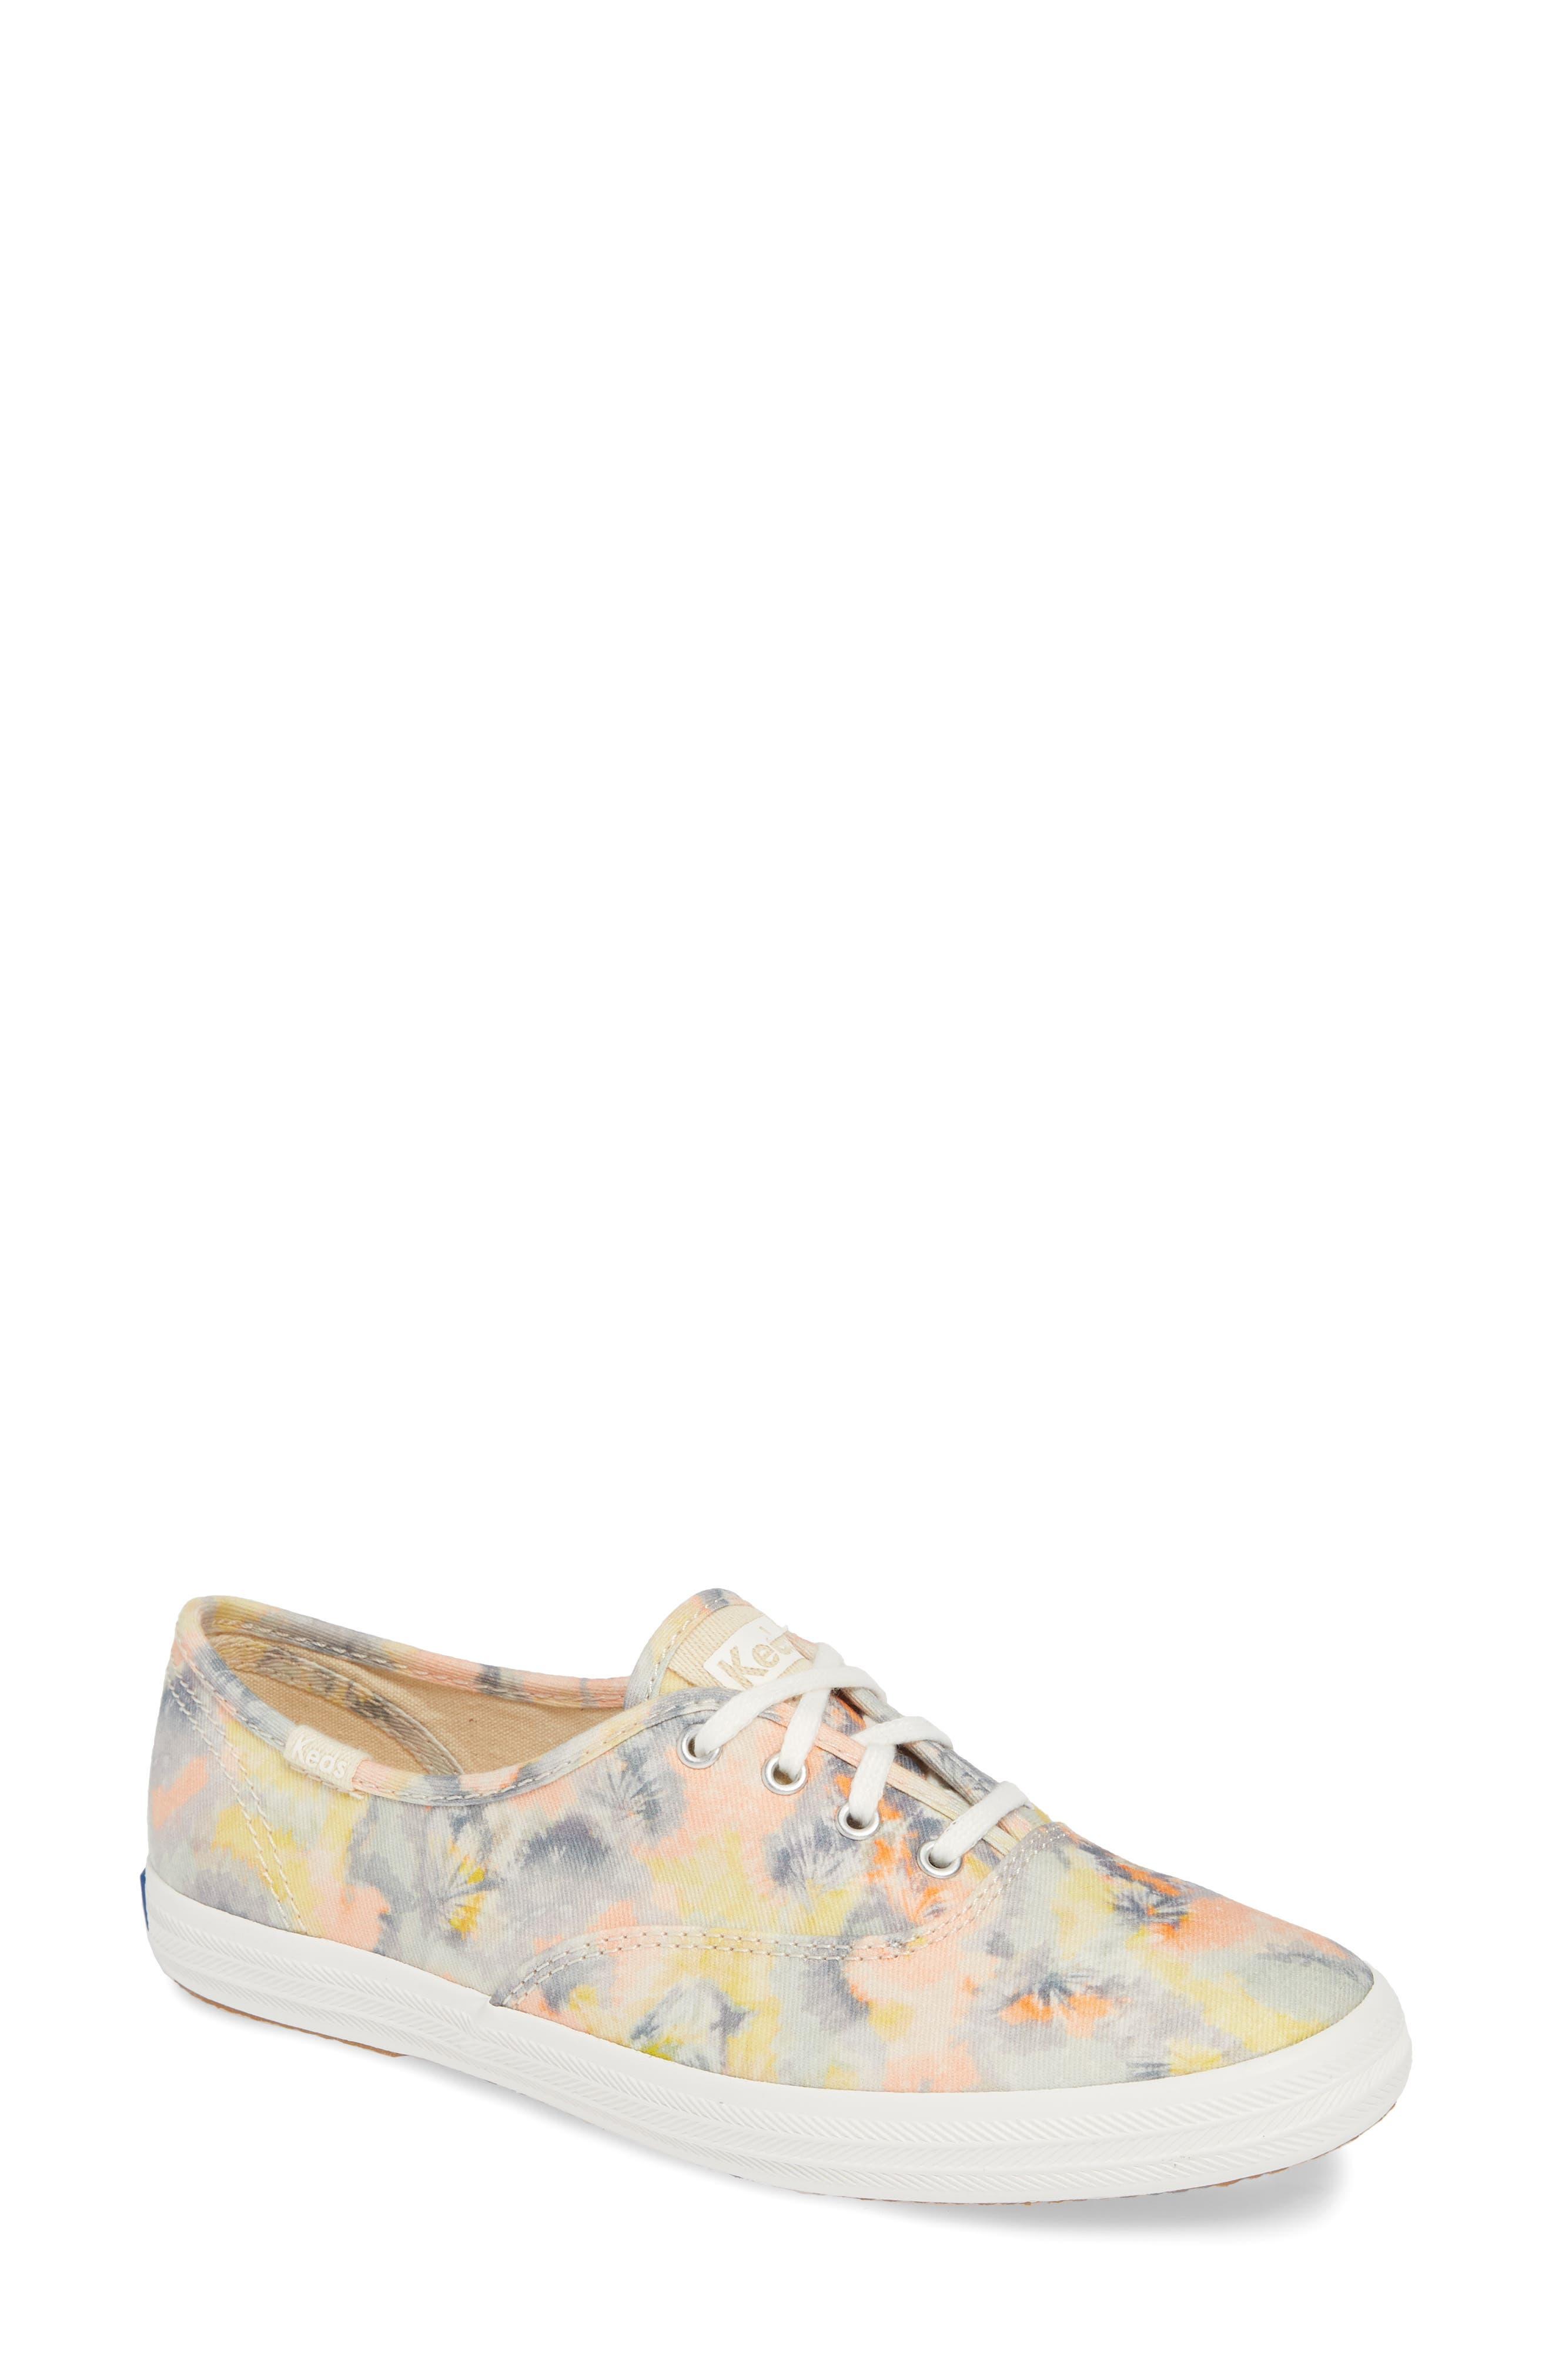 KEDS<SUP>®</SUP>, Champion Tie Dye Sneaker, Main thumbnail 1, color, PINK MULTI